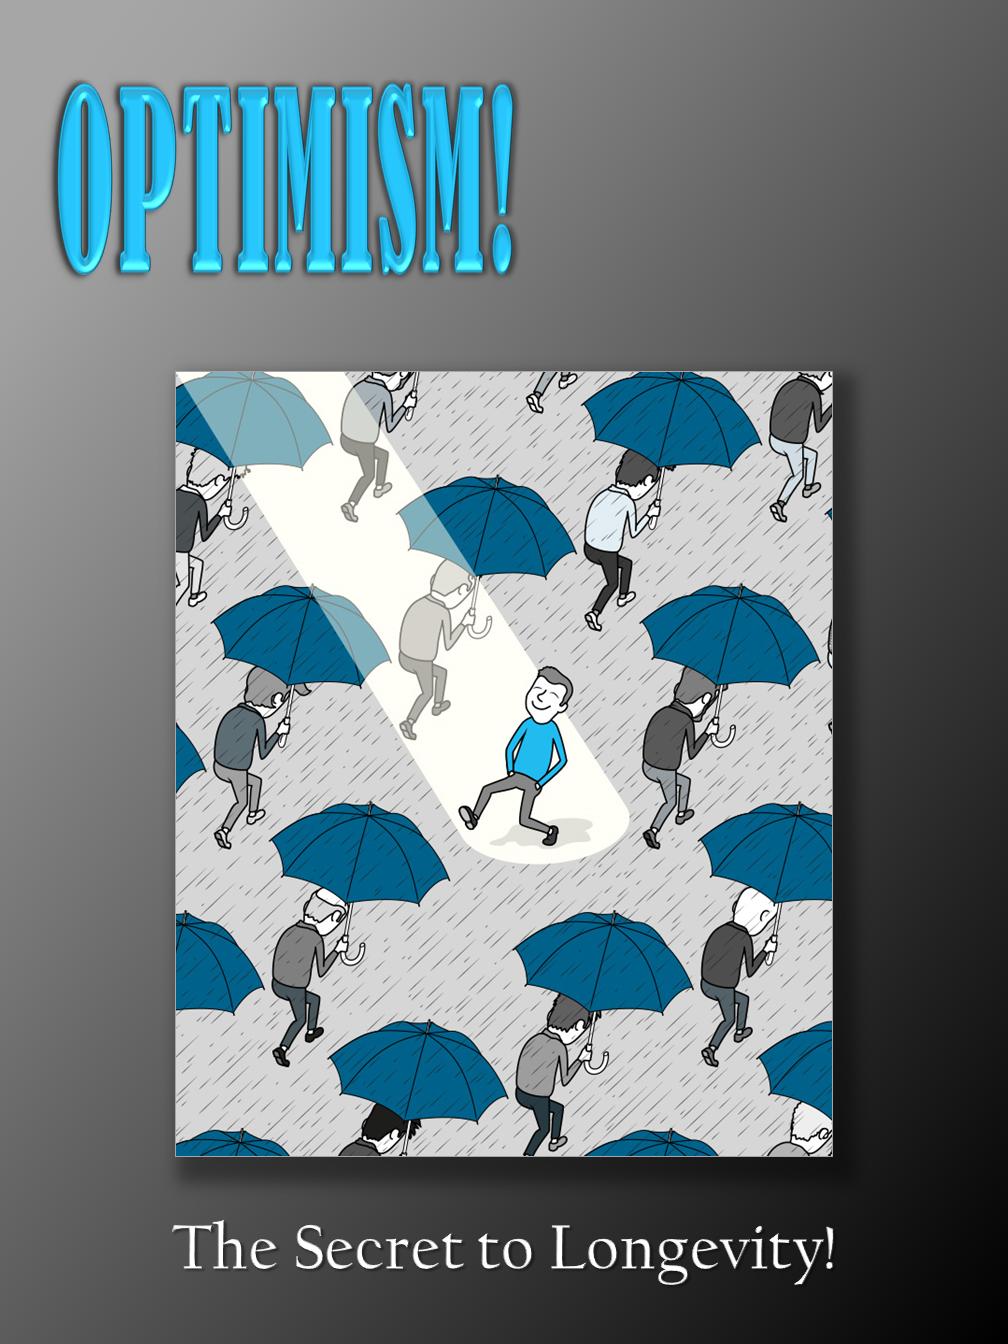 Optimism & Longivity